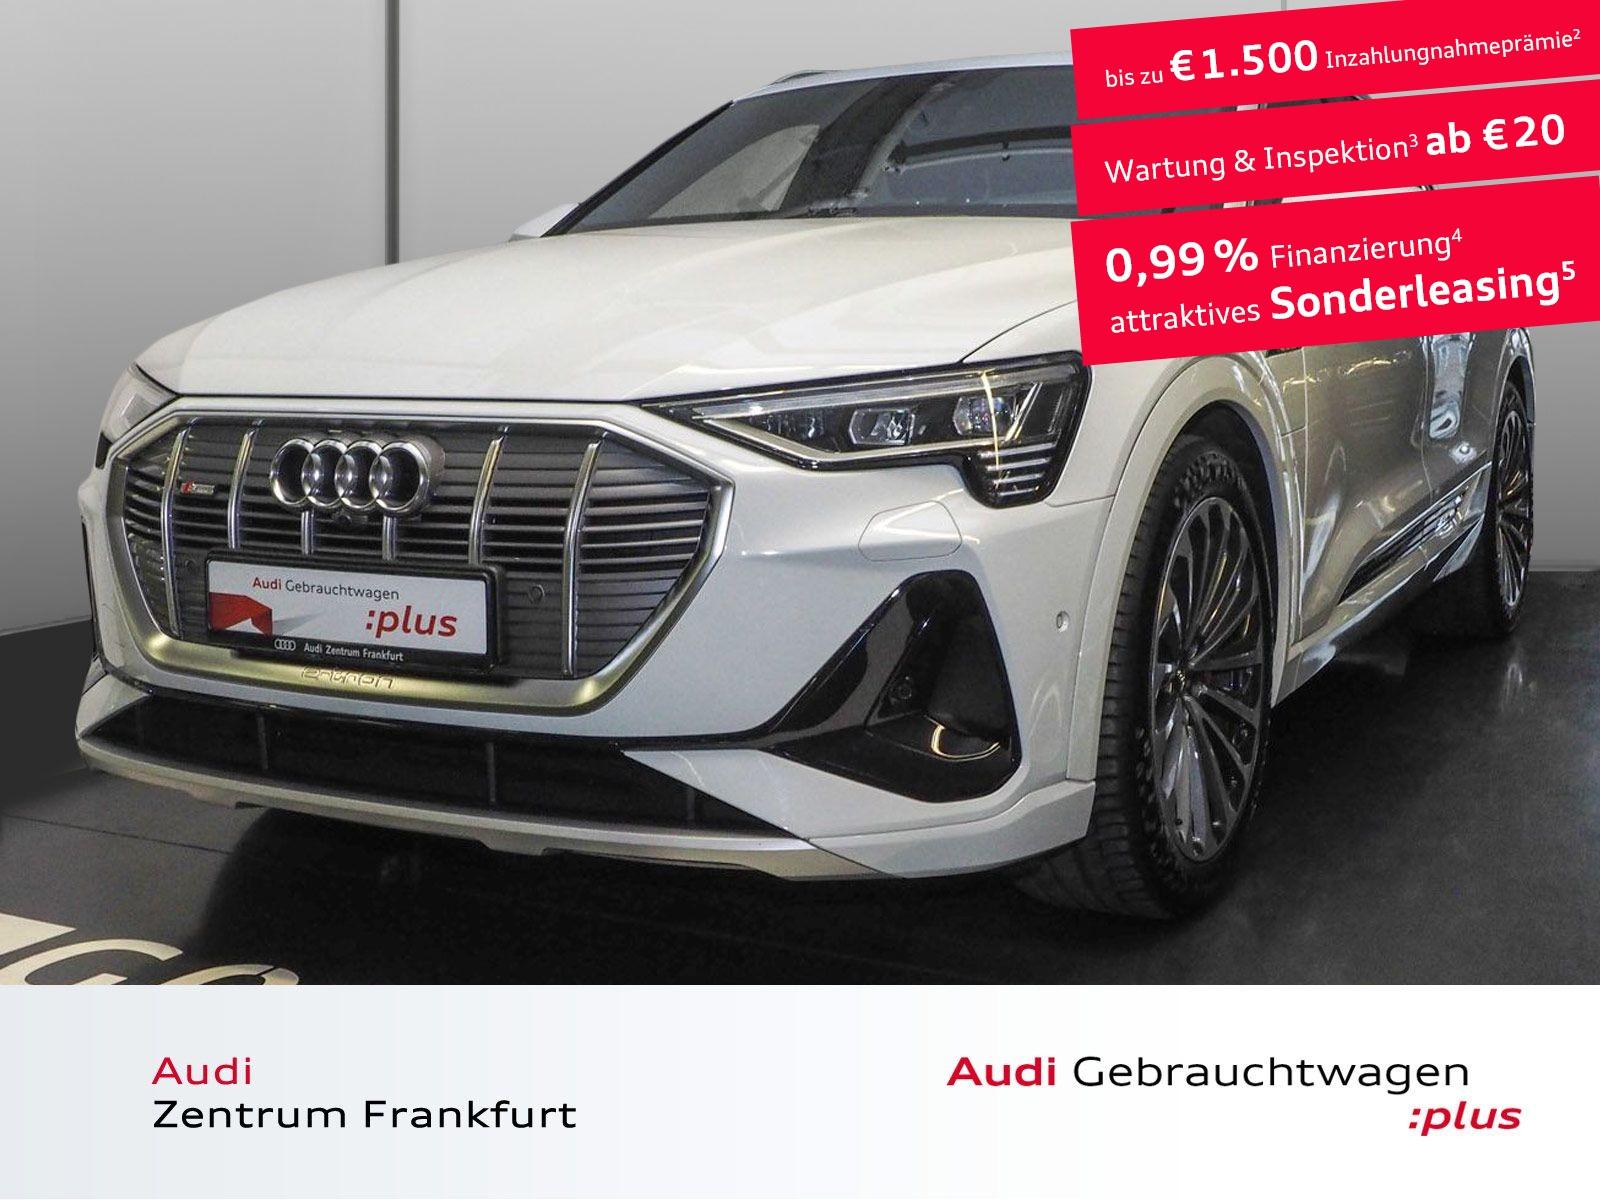 Audi e-tron 55 quattro S line Matrix-LED Navi HuD Panorama, Jahr 2020, Elektro